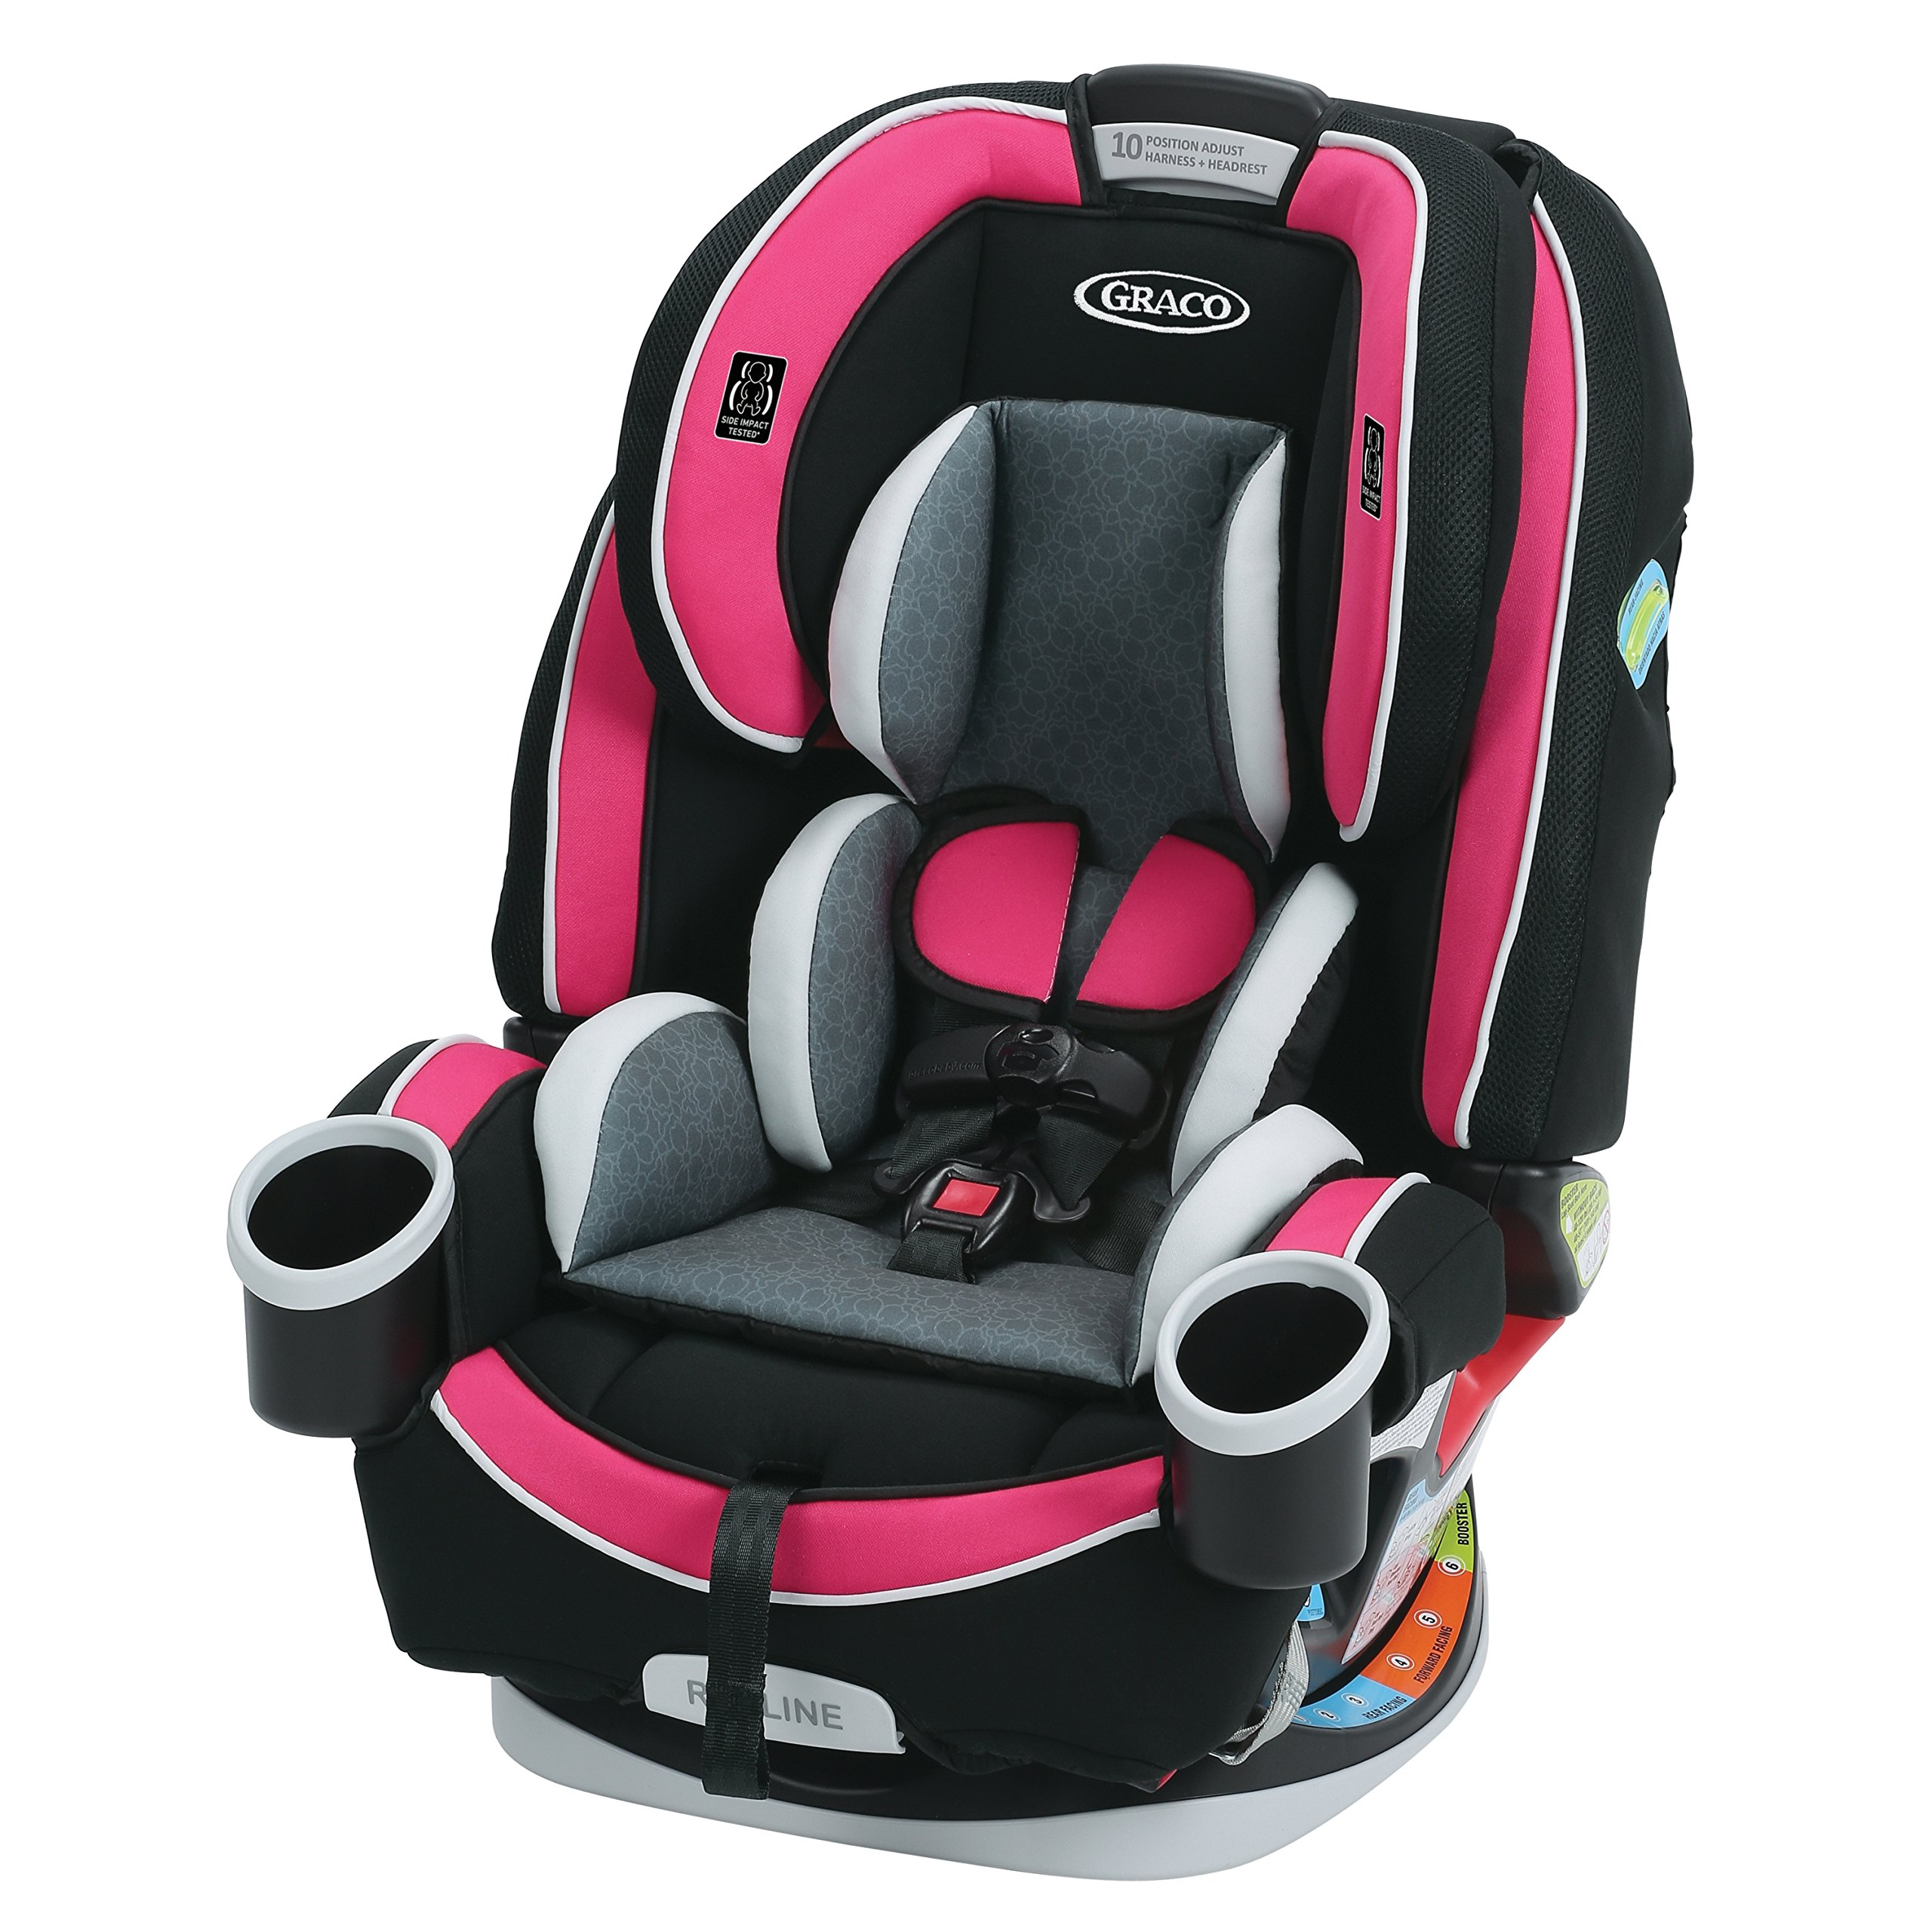 Graco 4Ever 4-in-1 Convertible Car Seat, Azalea